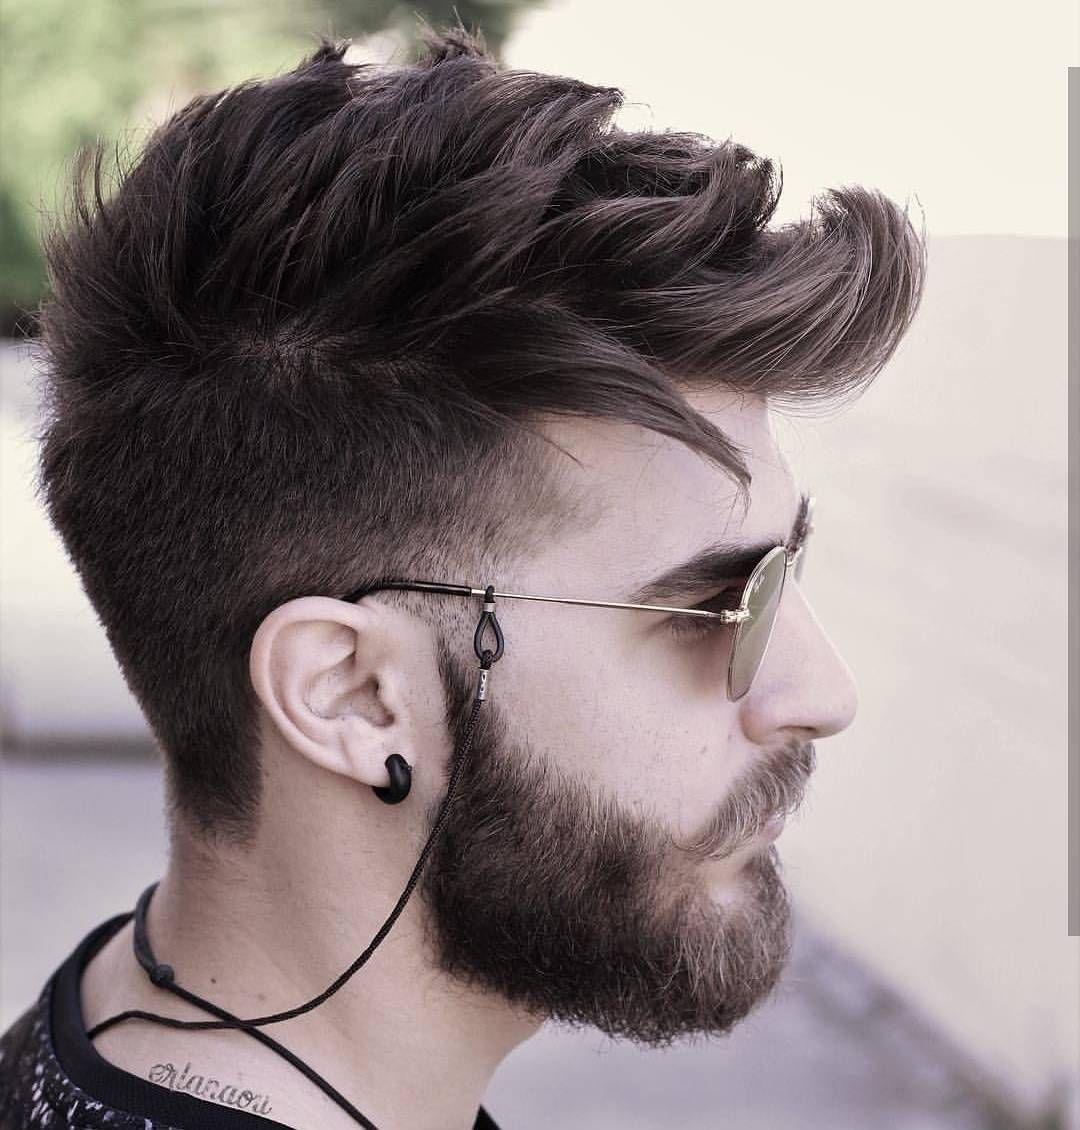 Boy hair style cutting erkeksacmodelleri  hair  pinterest  hair style male hair and